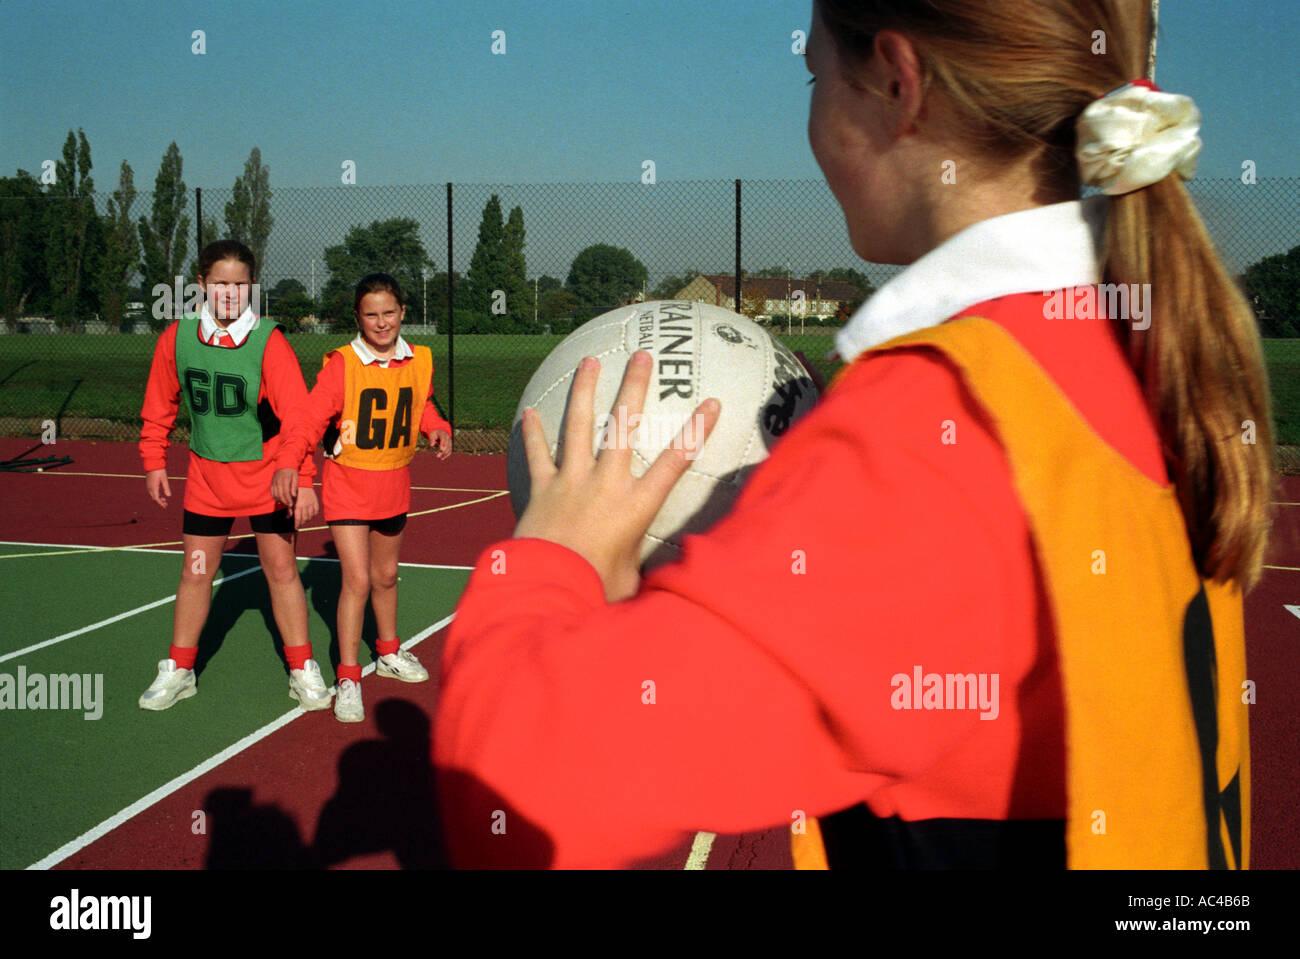 Las hembras playinGBasket netball en una escuela secundaria Imagen De Stock